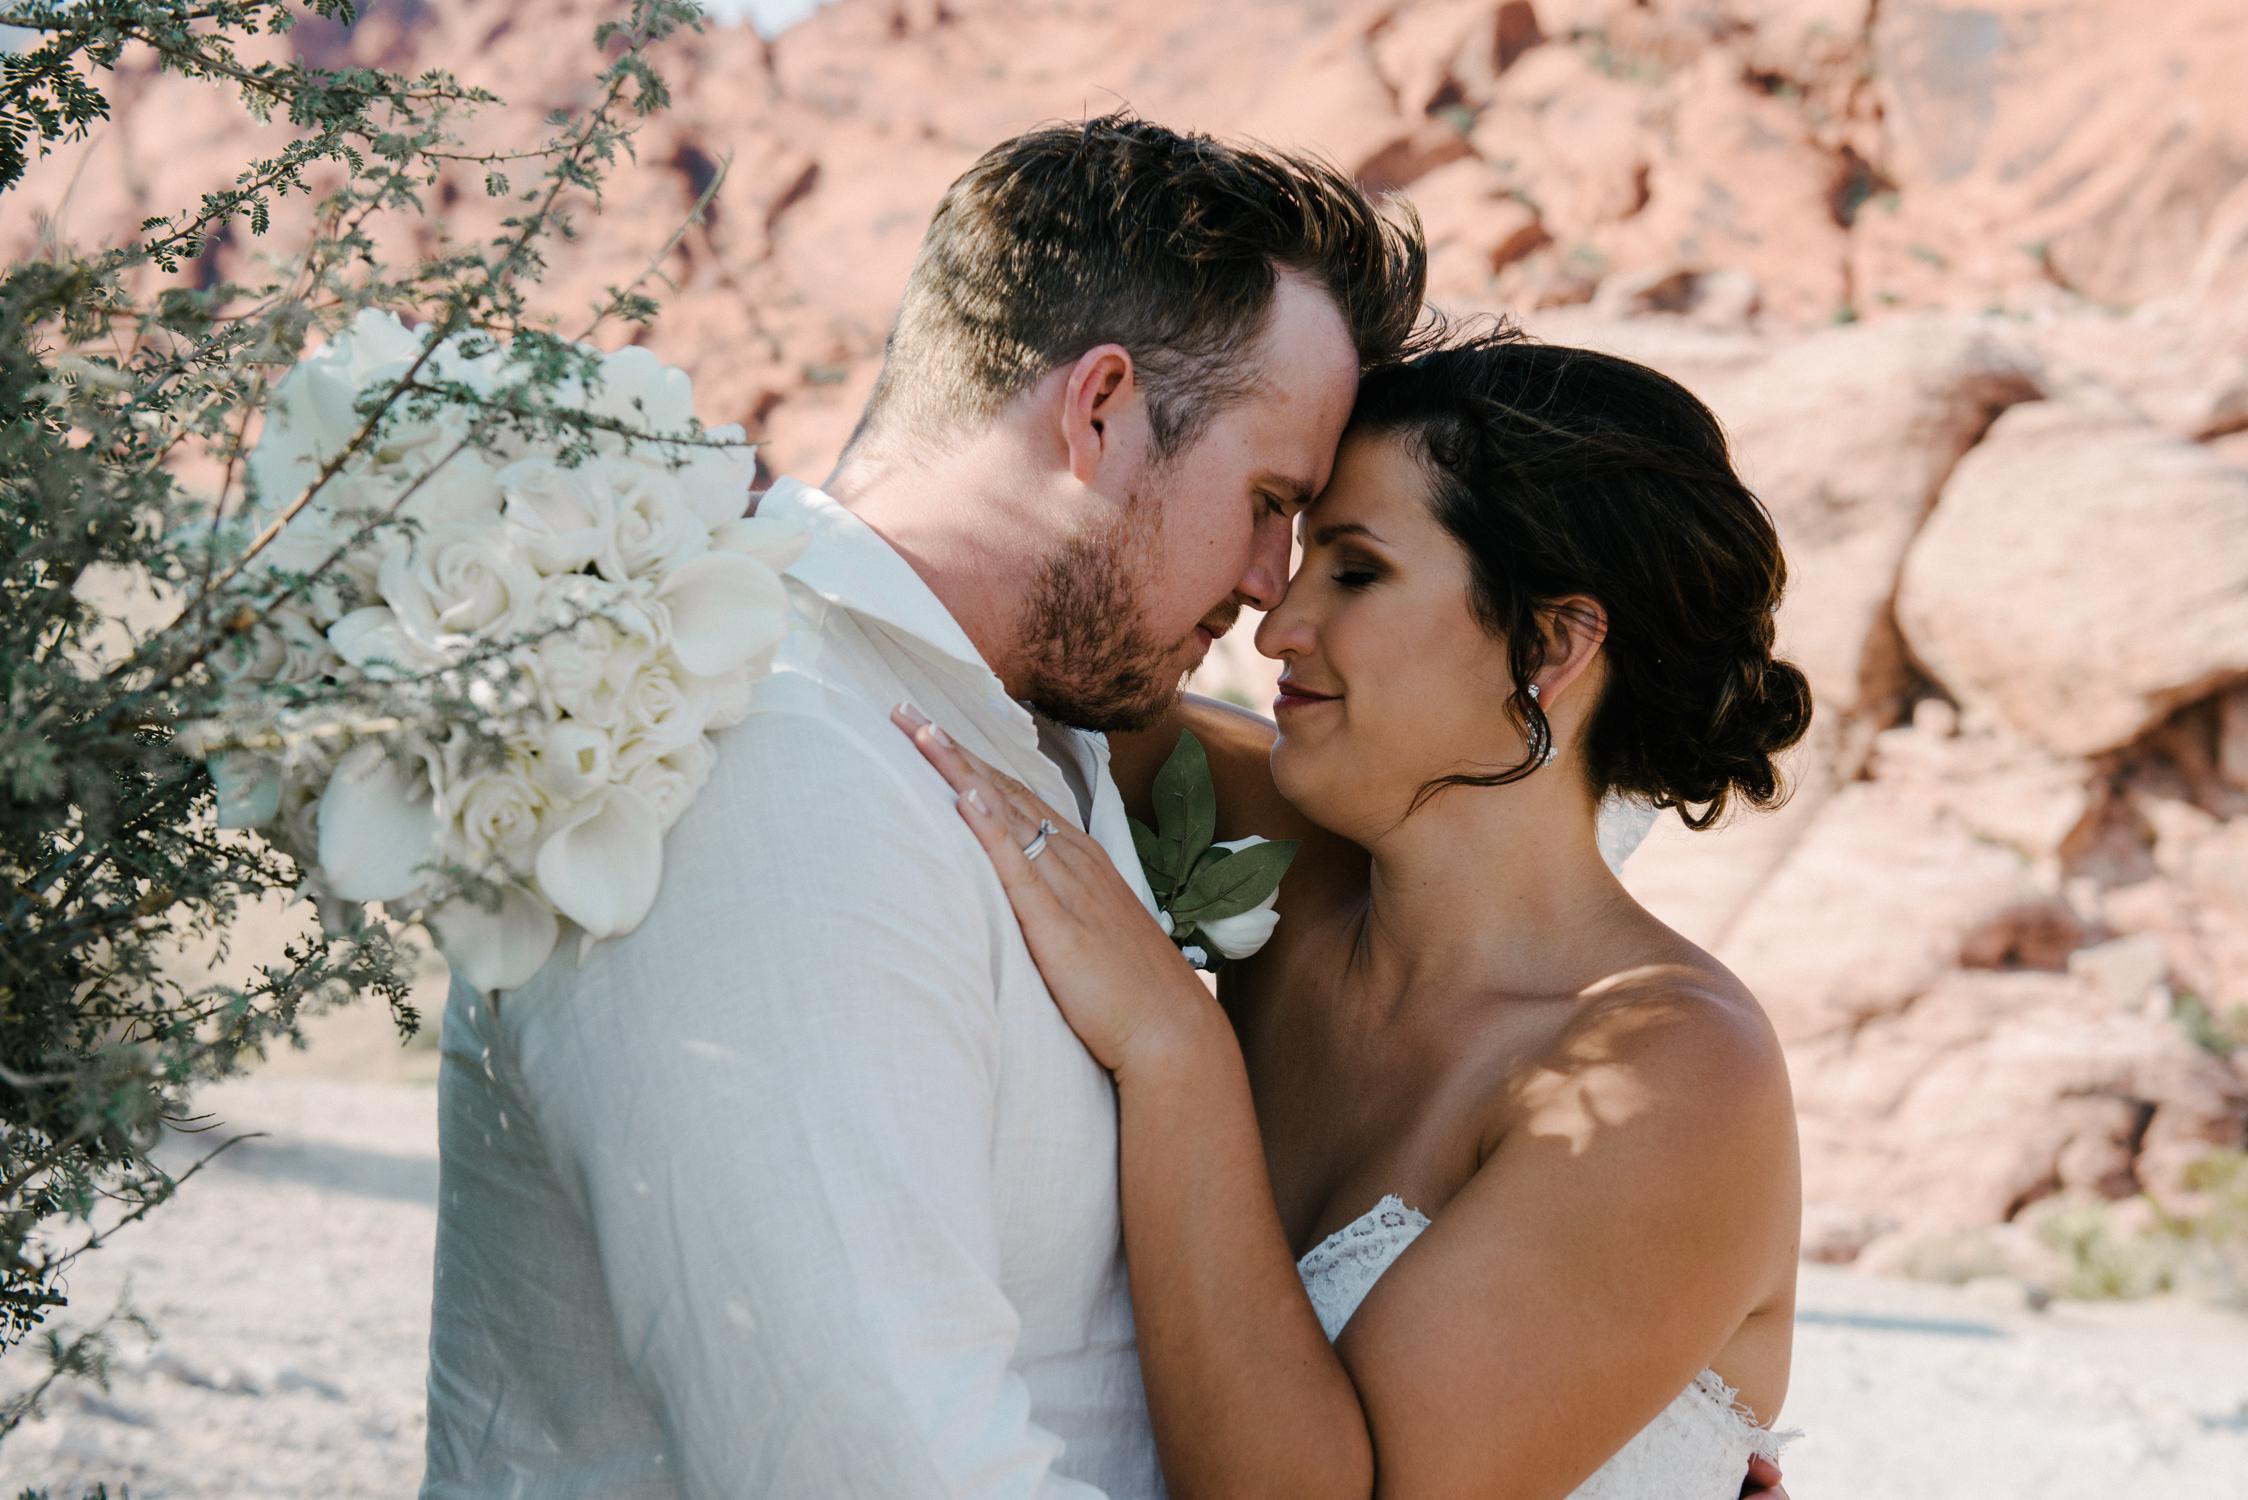 030_Redrock_canyon_vegas_wedding_photographer.jpg